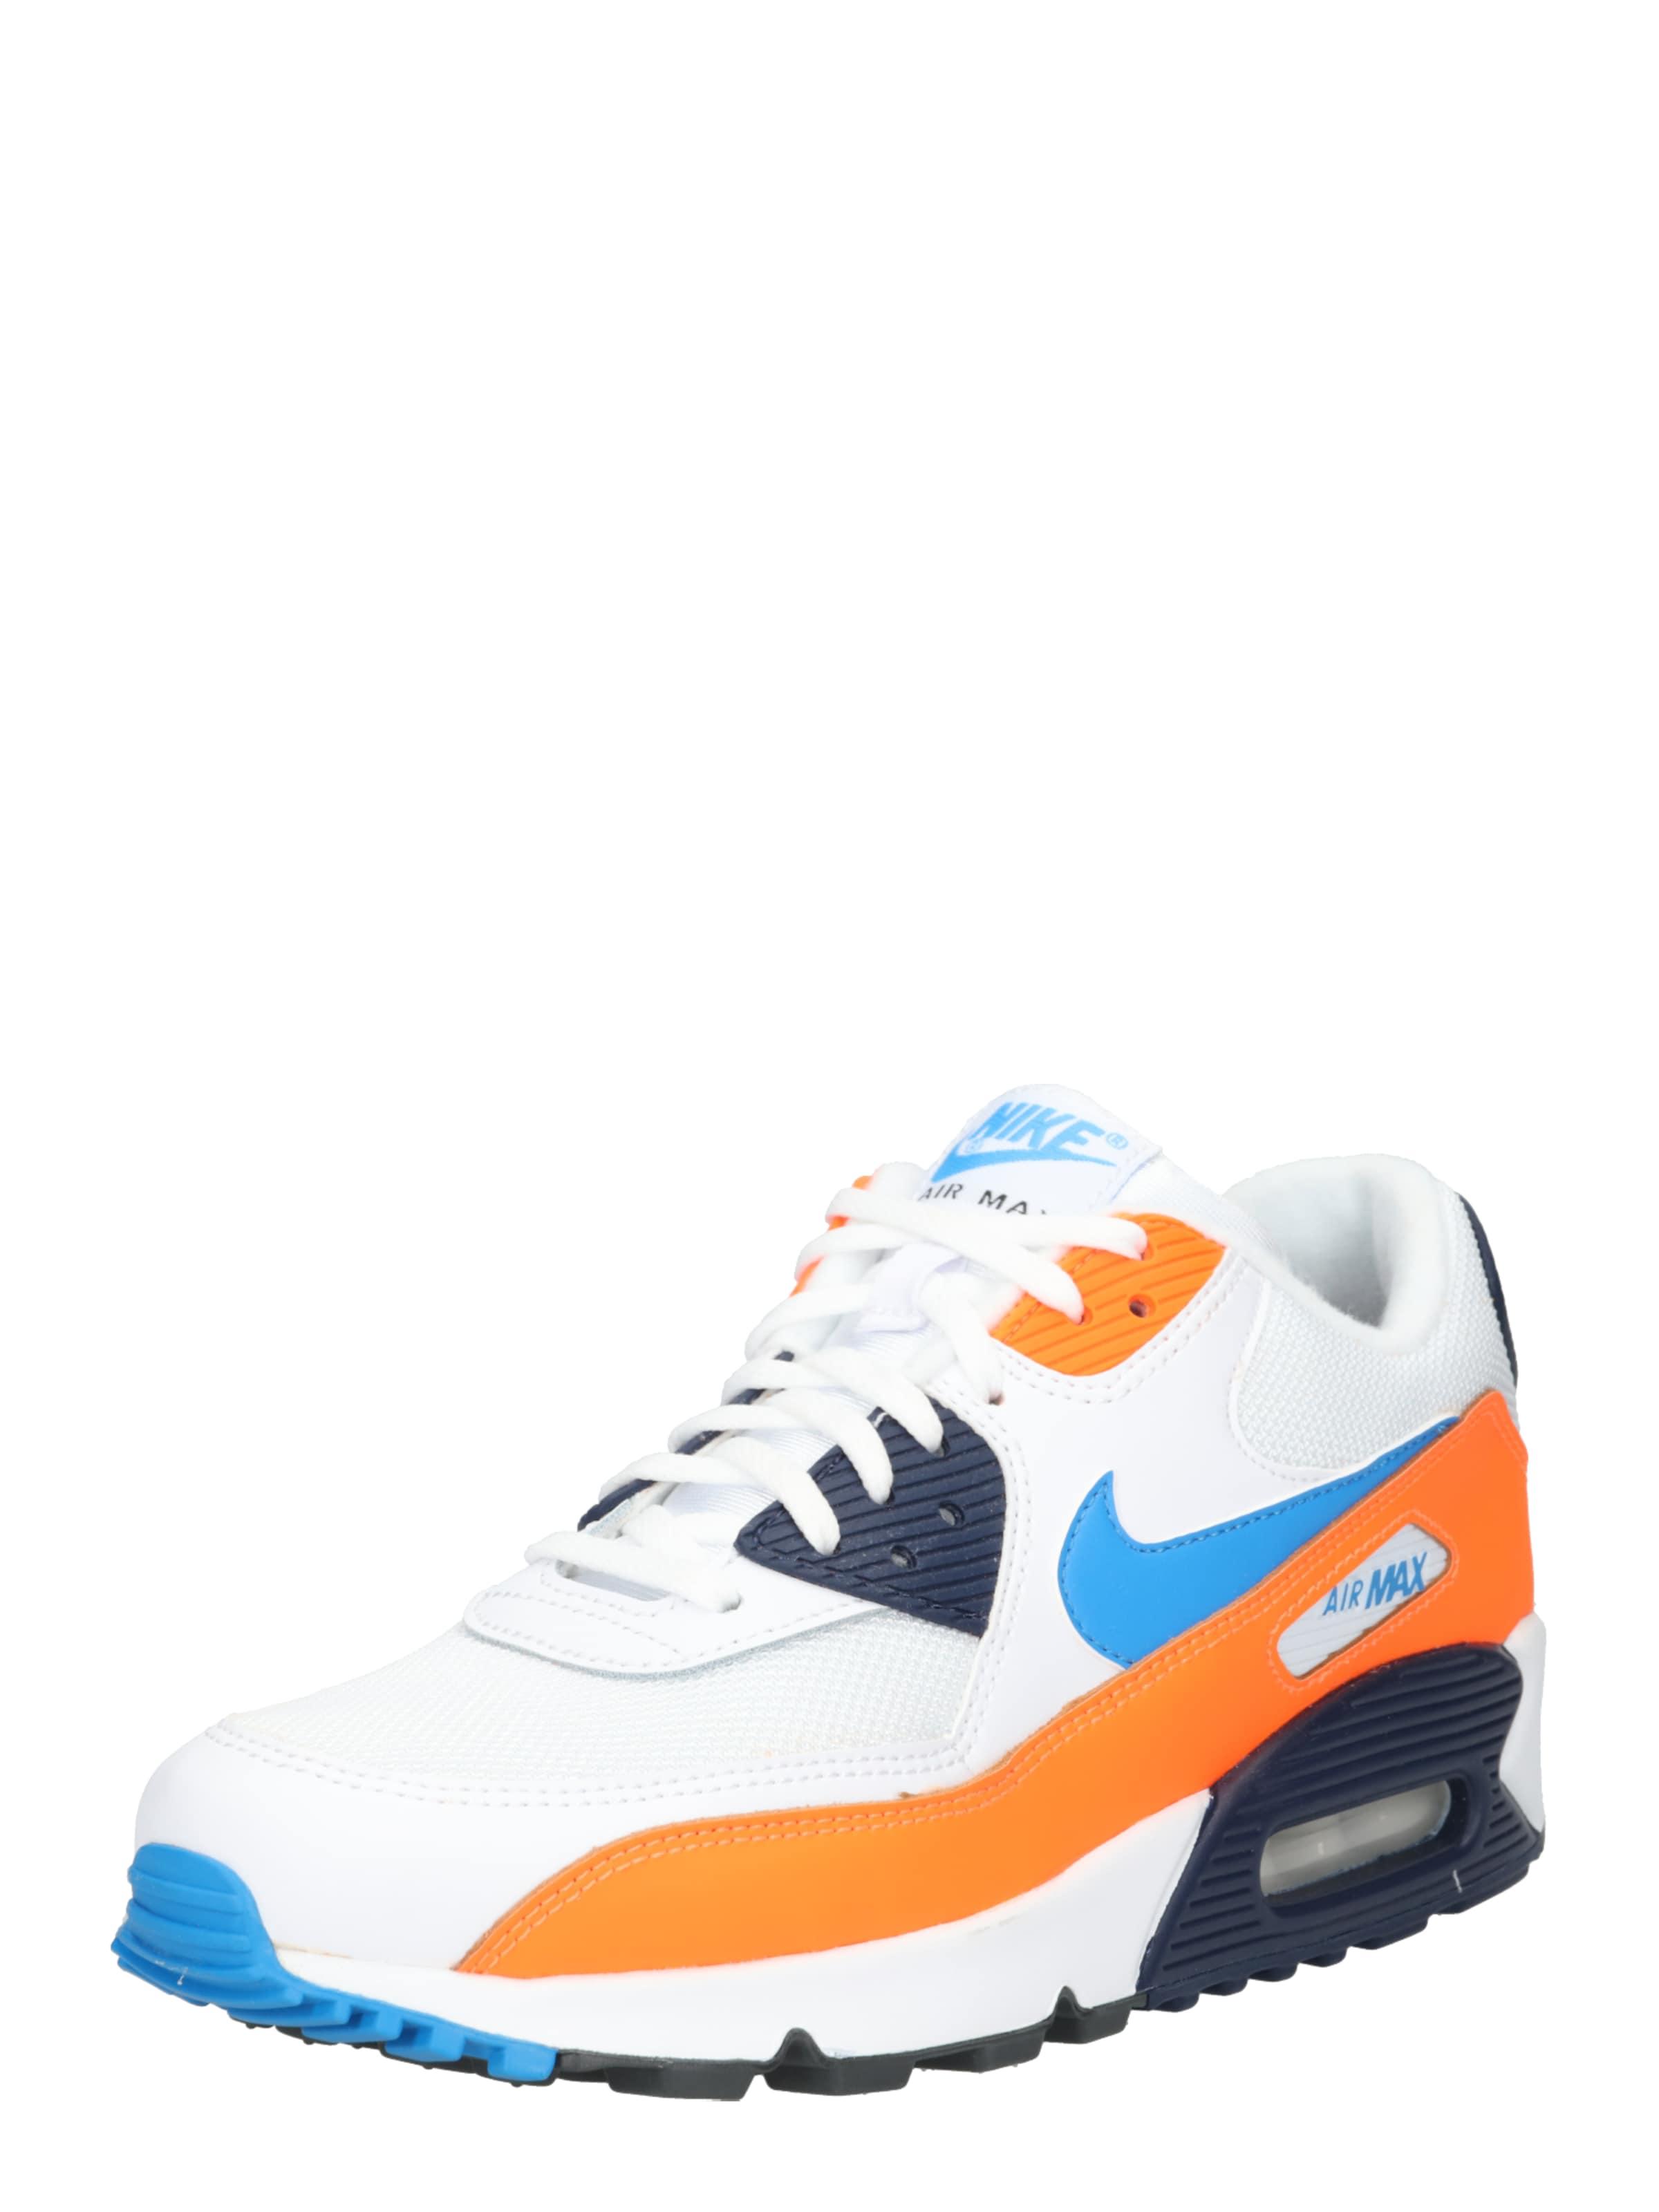 Max Essential' Sneaker Nike Low Sportswear OrangeWeiß '90 'air In clJTK1F3